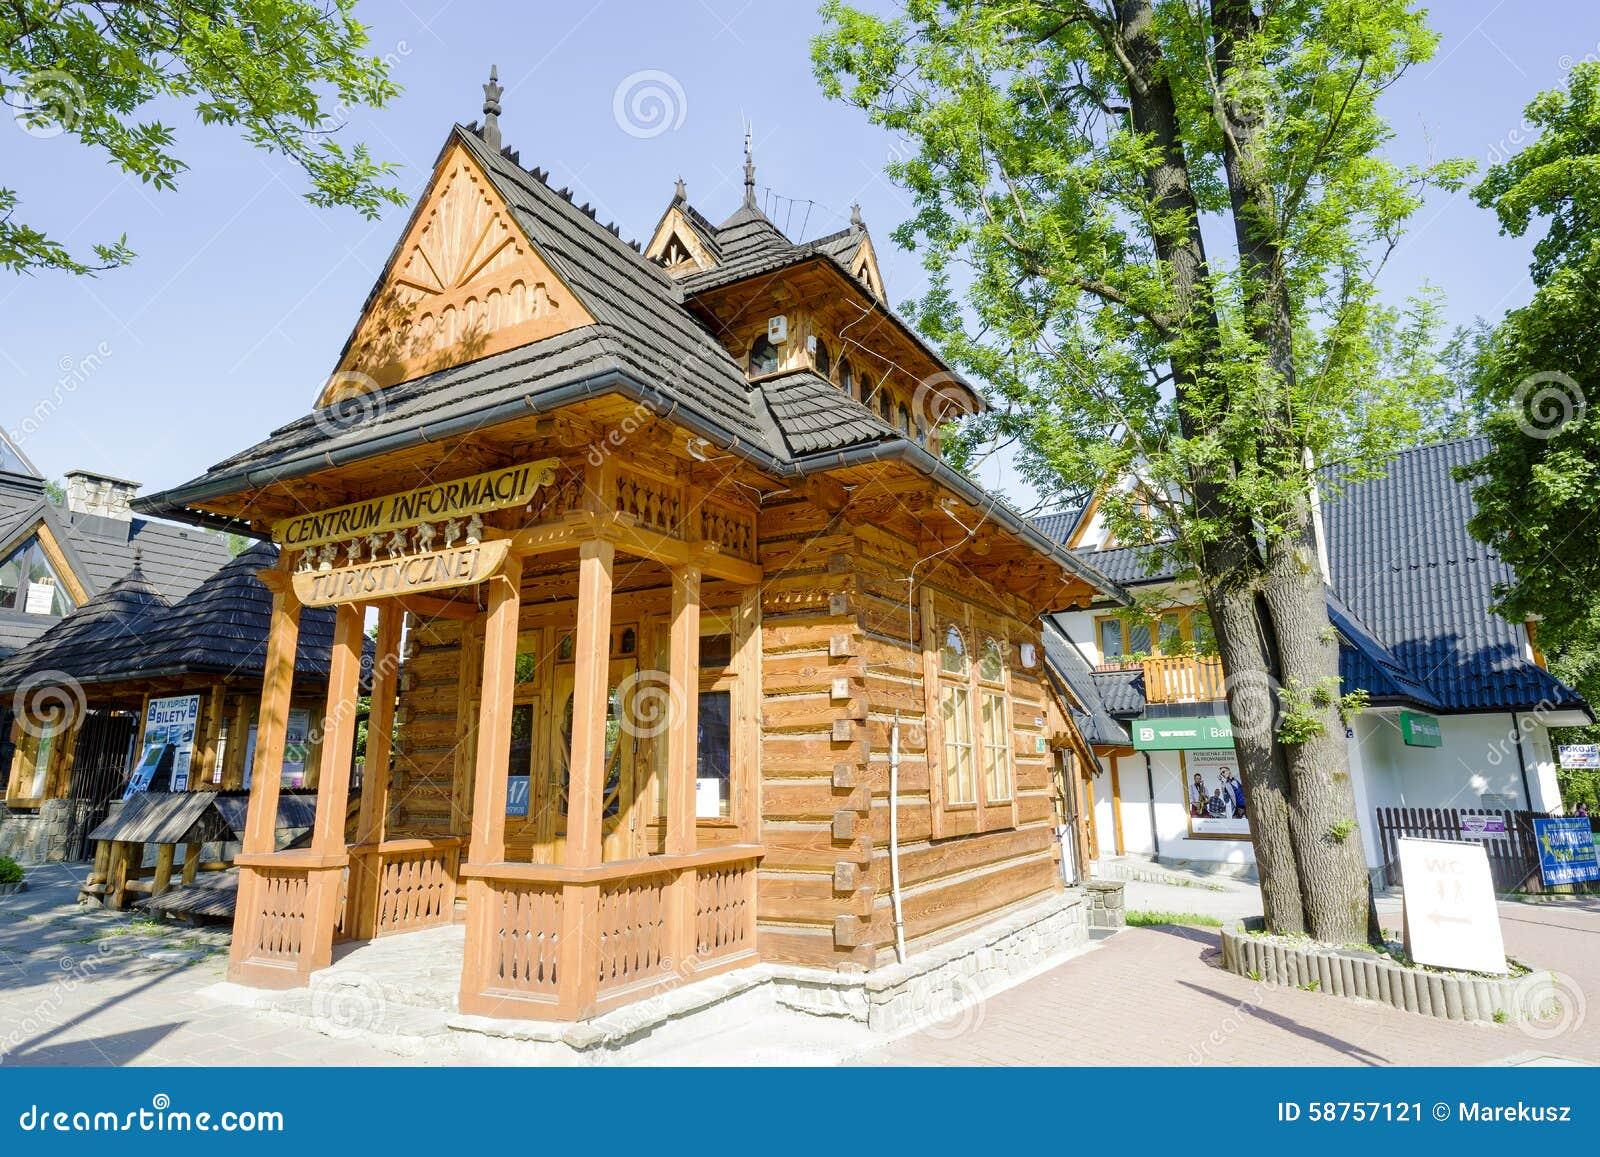 Pocztowka Small Wooden House In Zakopane Editorial Photo Image Of